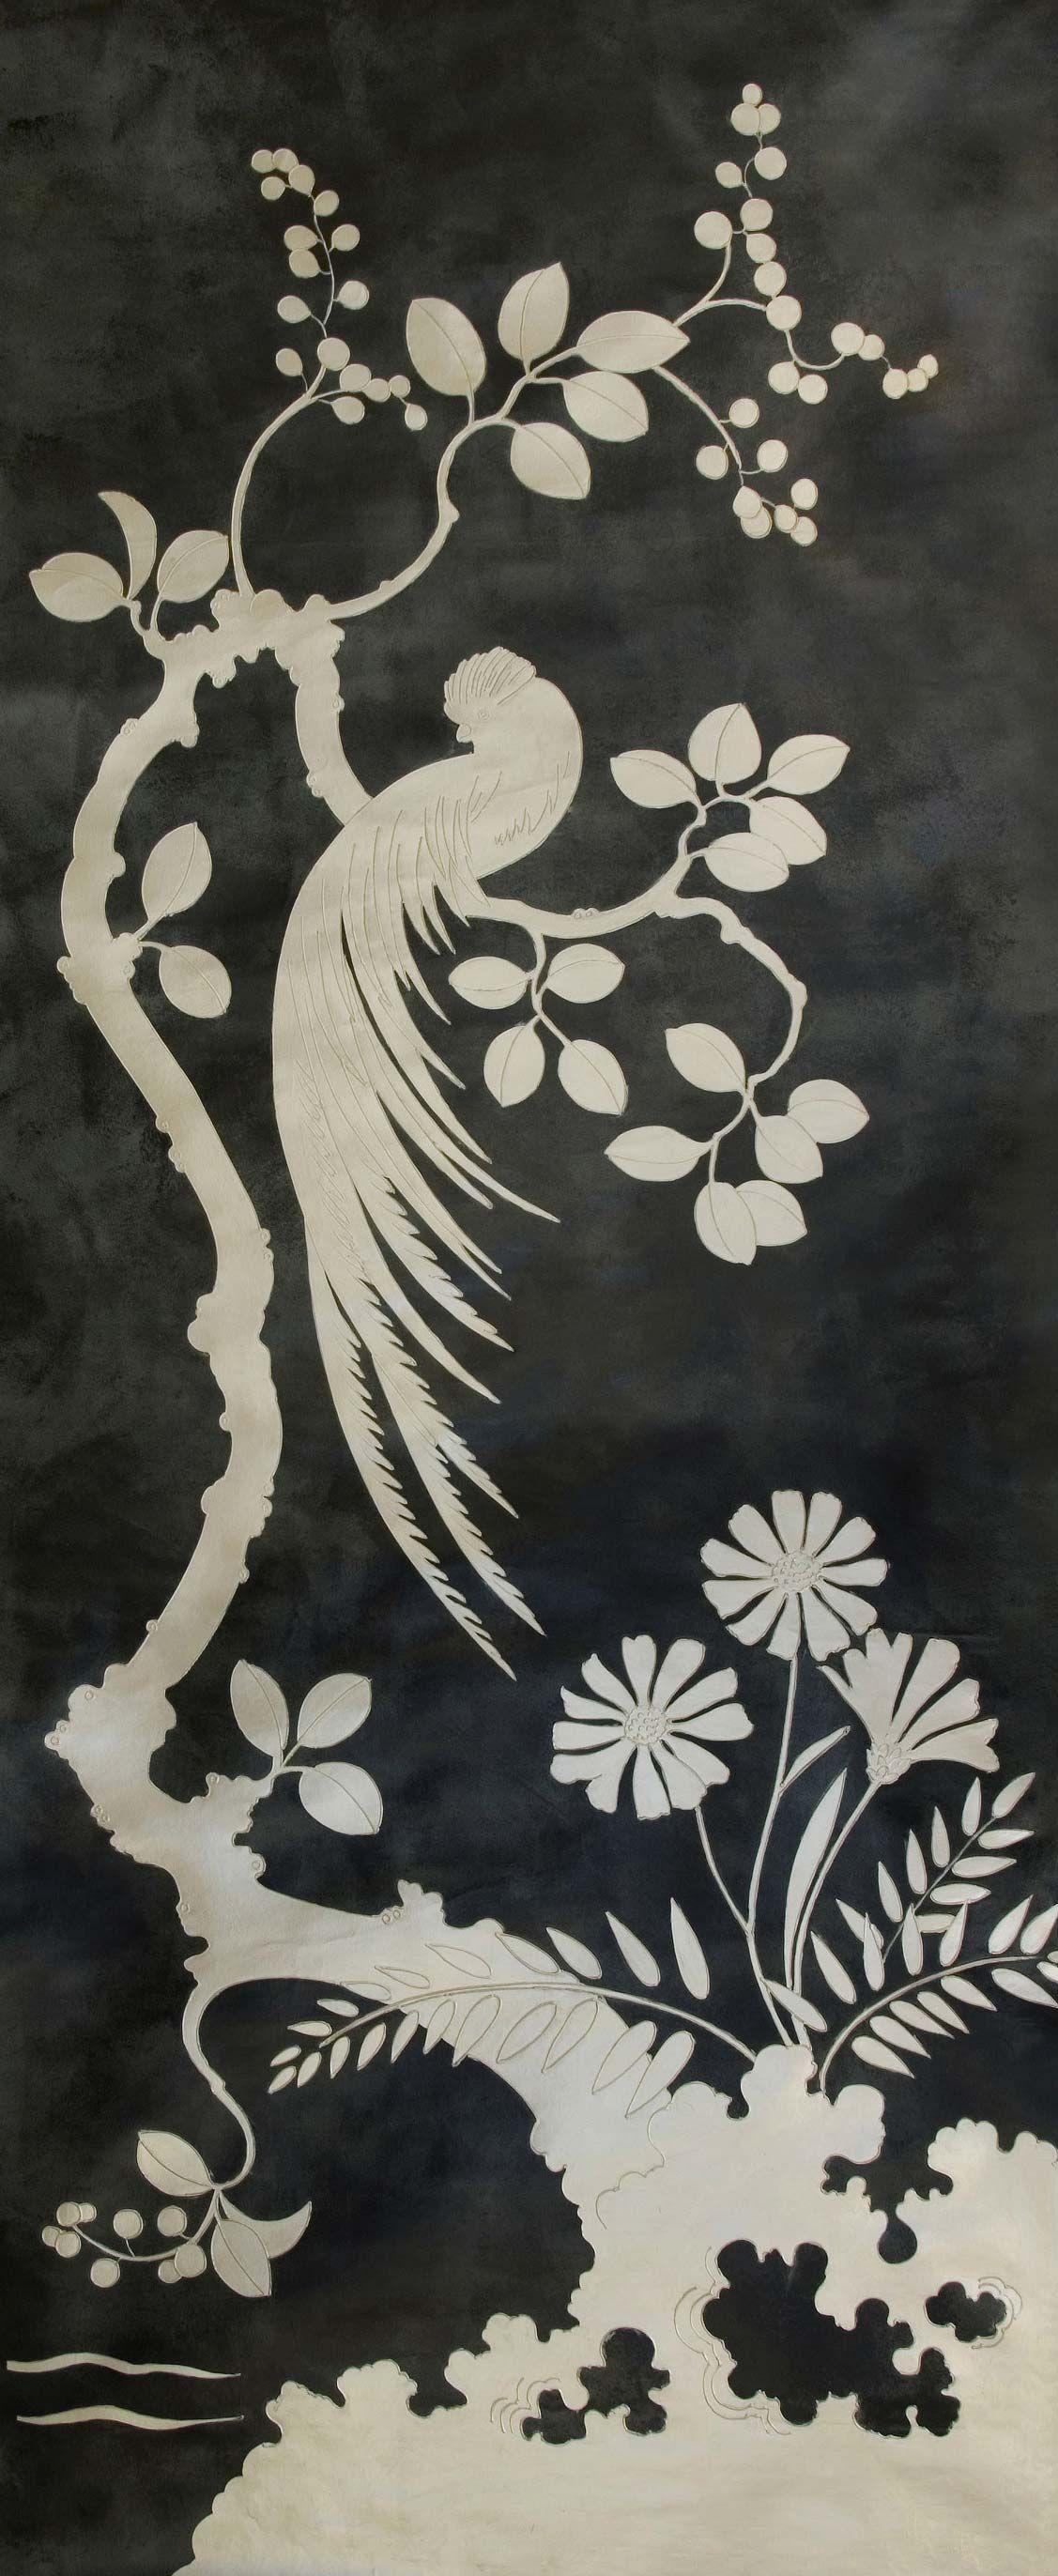 chinon Fromental chinoiserie wallpaper black + white